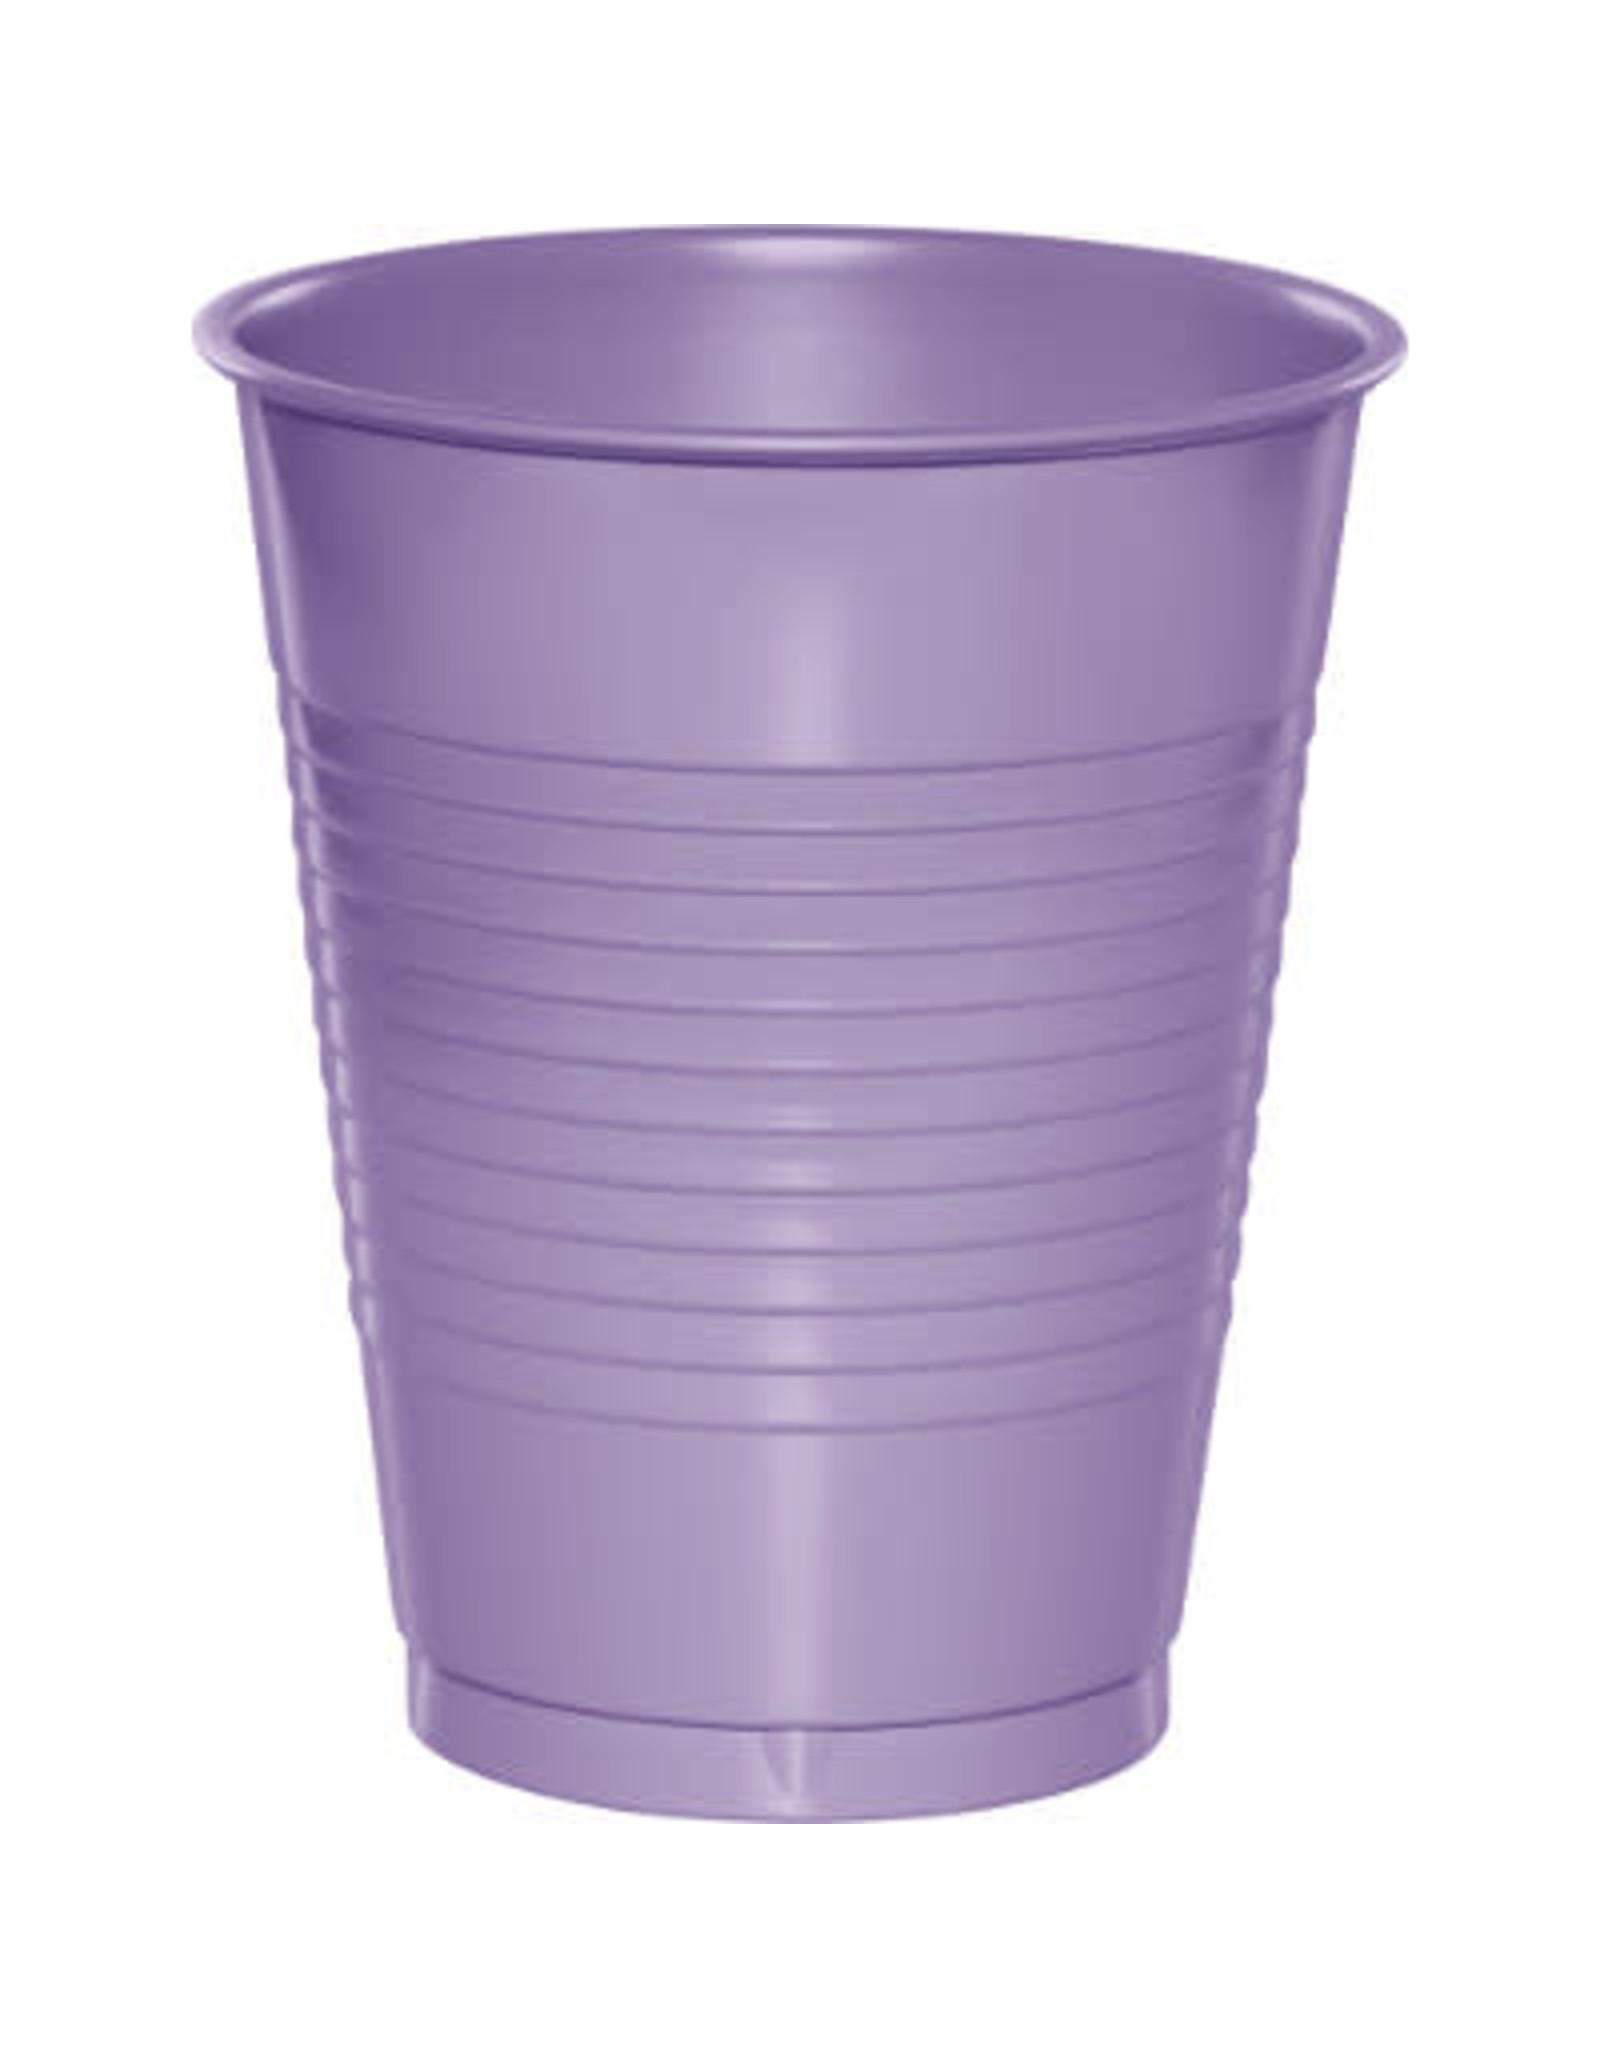 Touch of Color 16oz LUSCIOUS LAVENDER PLASTIC CUPS